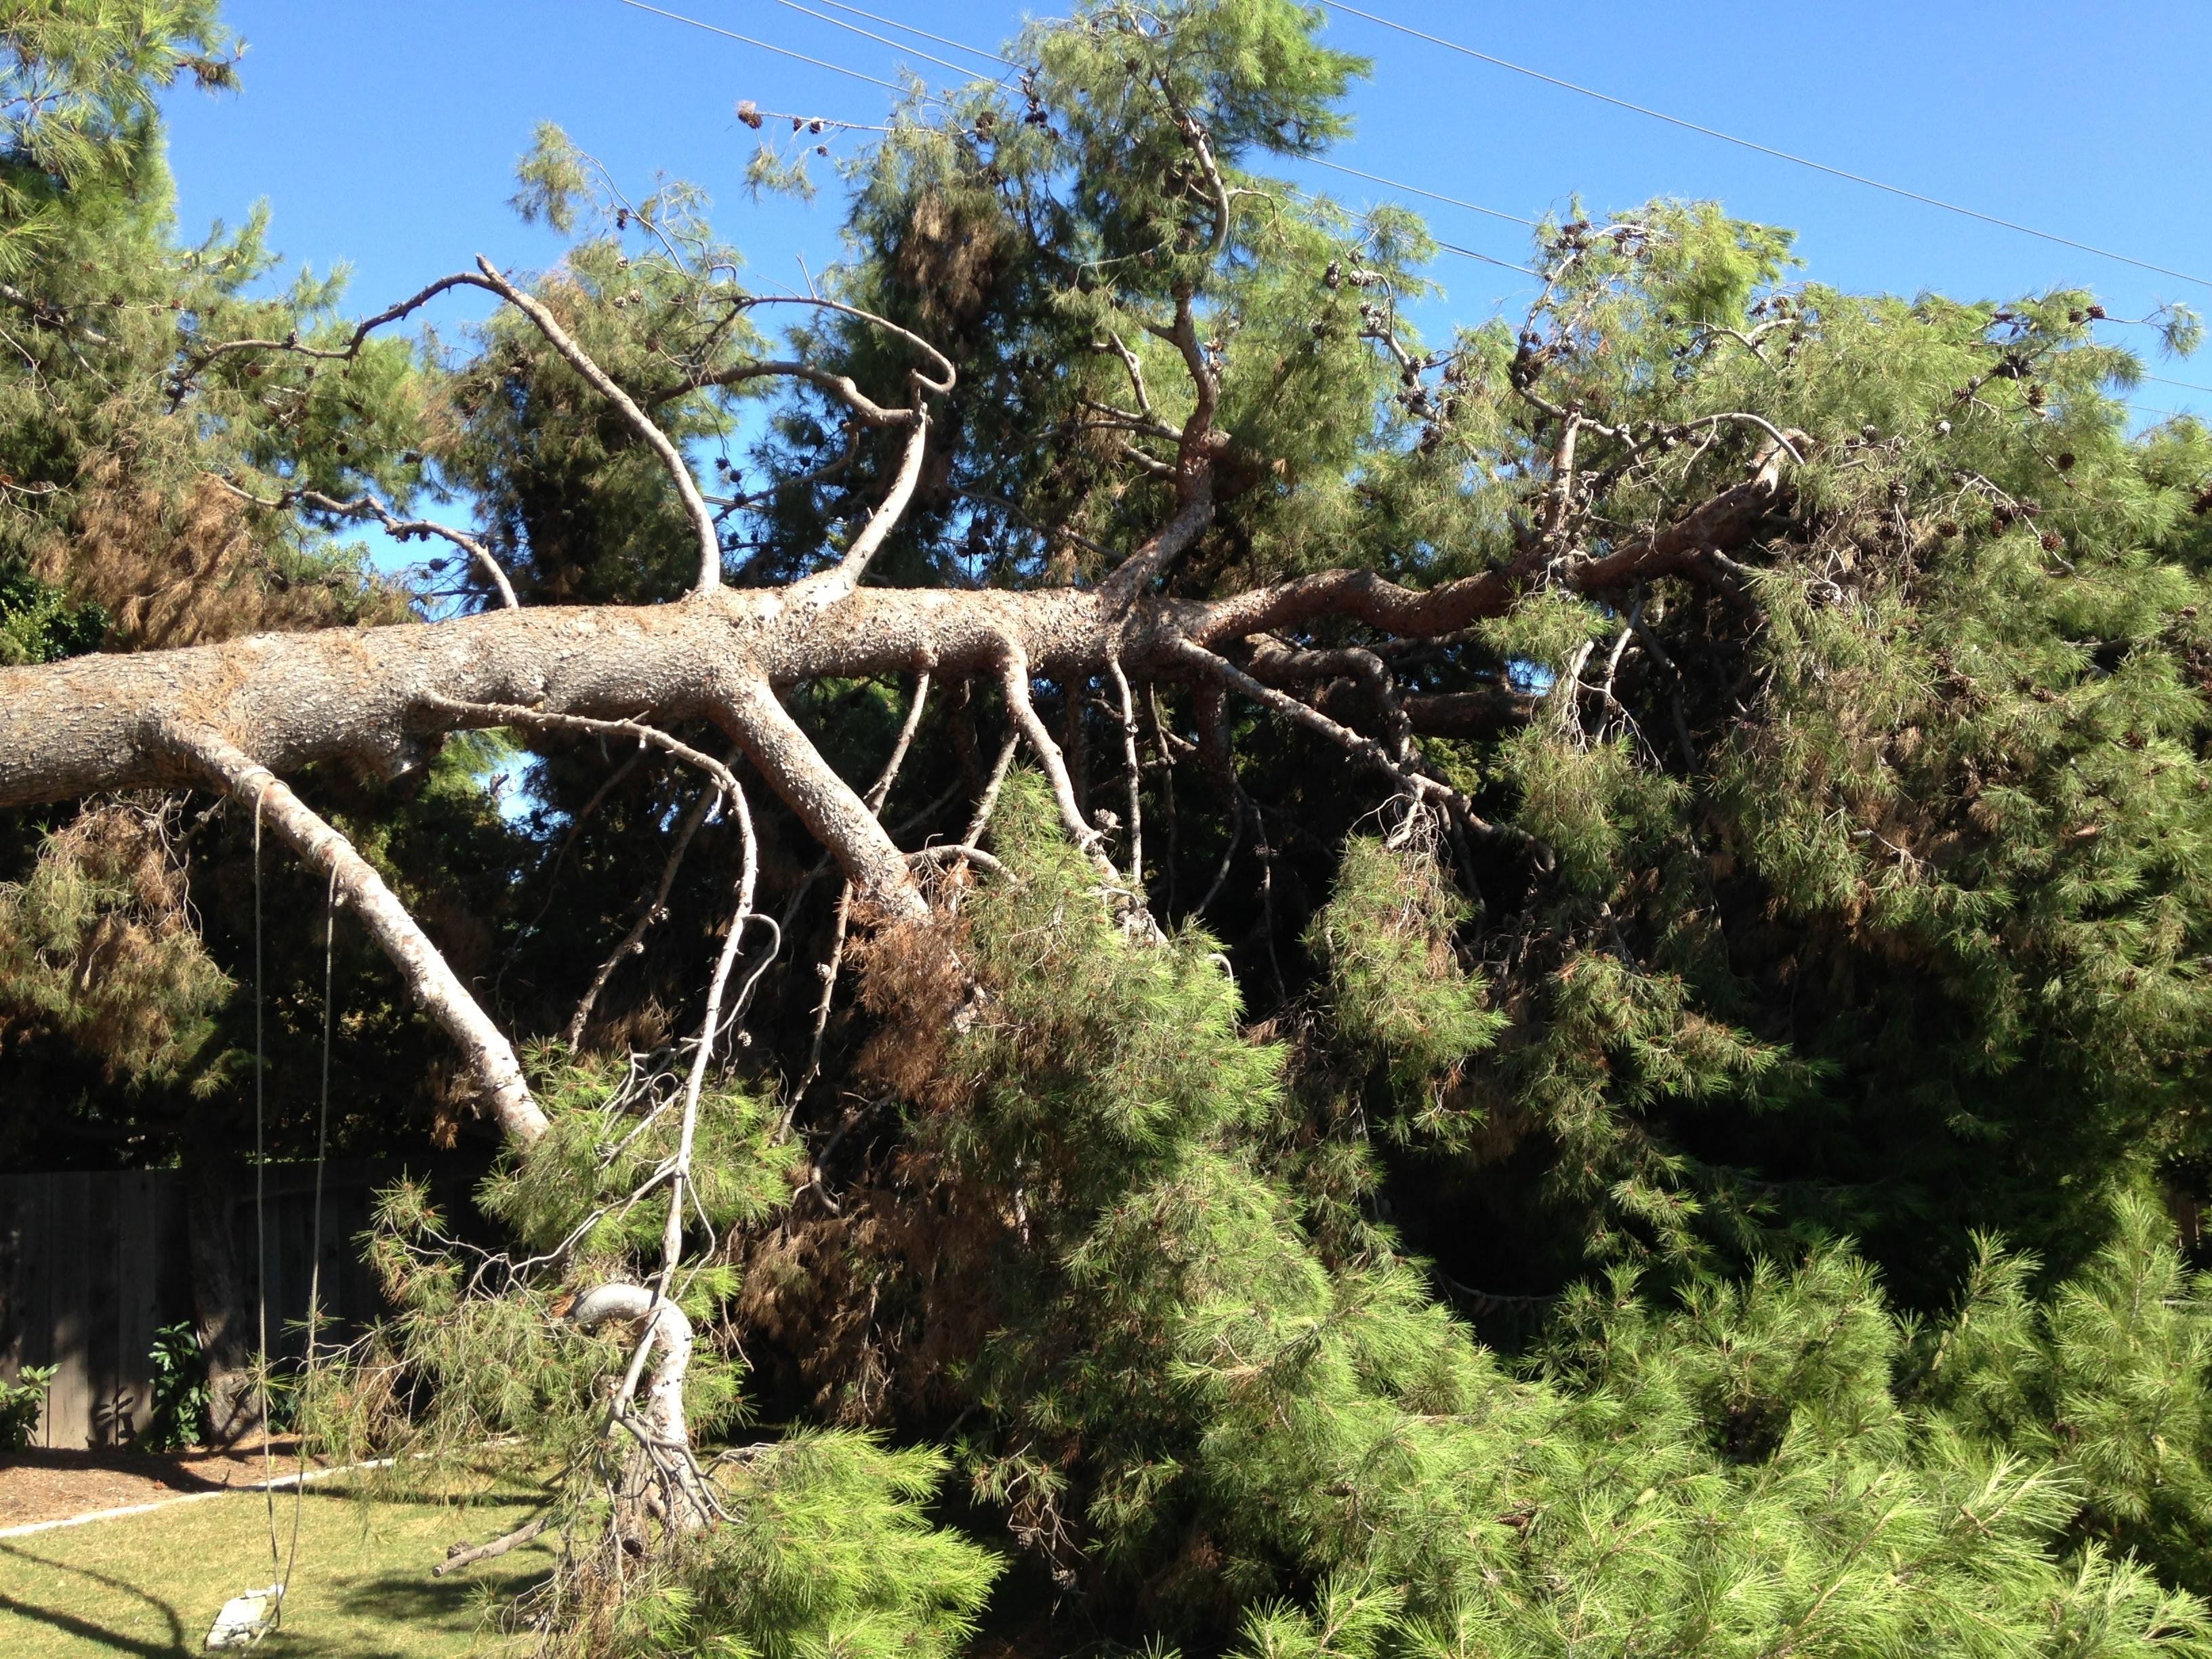 Salomon's Tree Service, LLC image 1